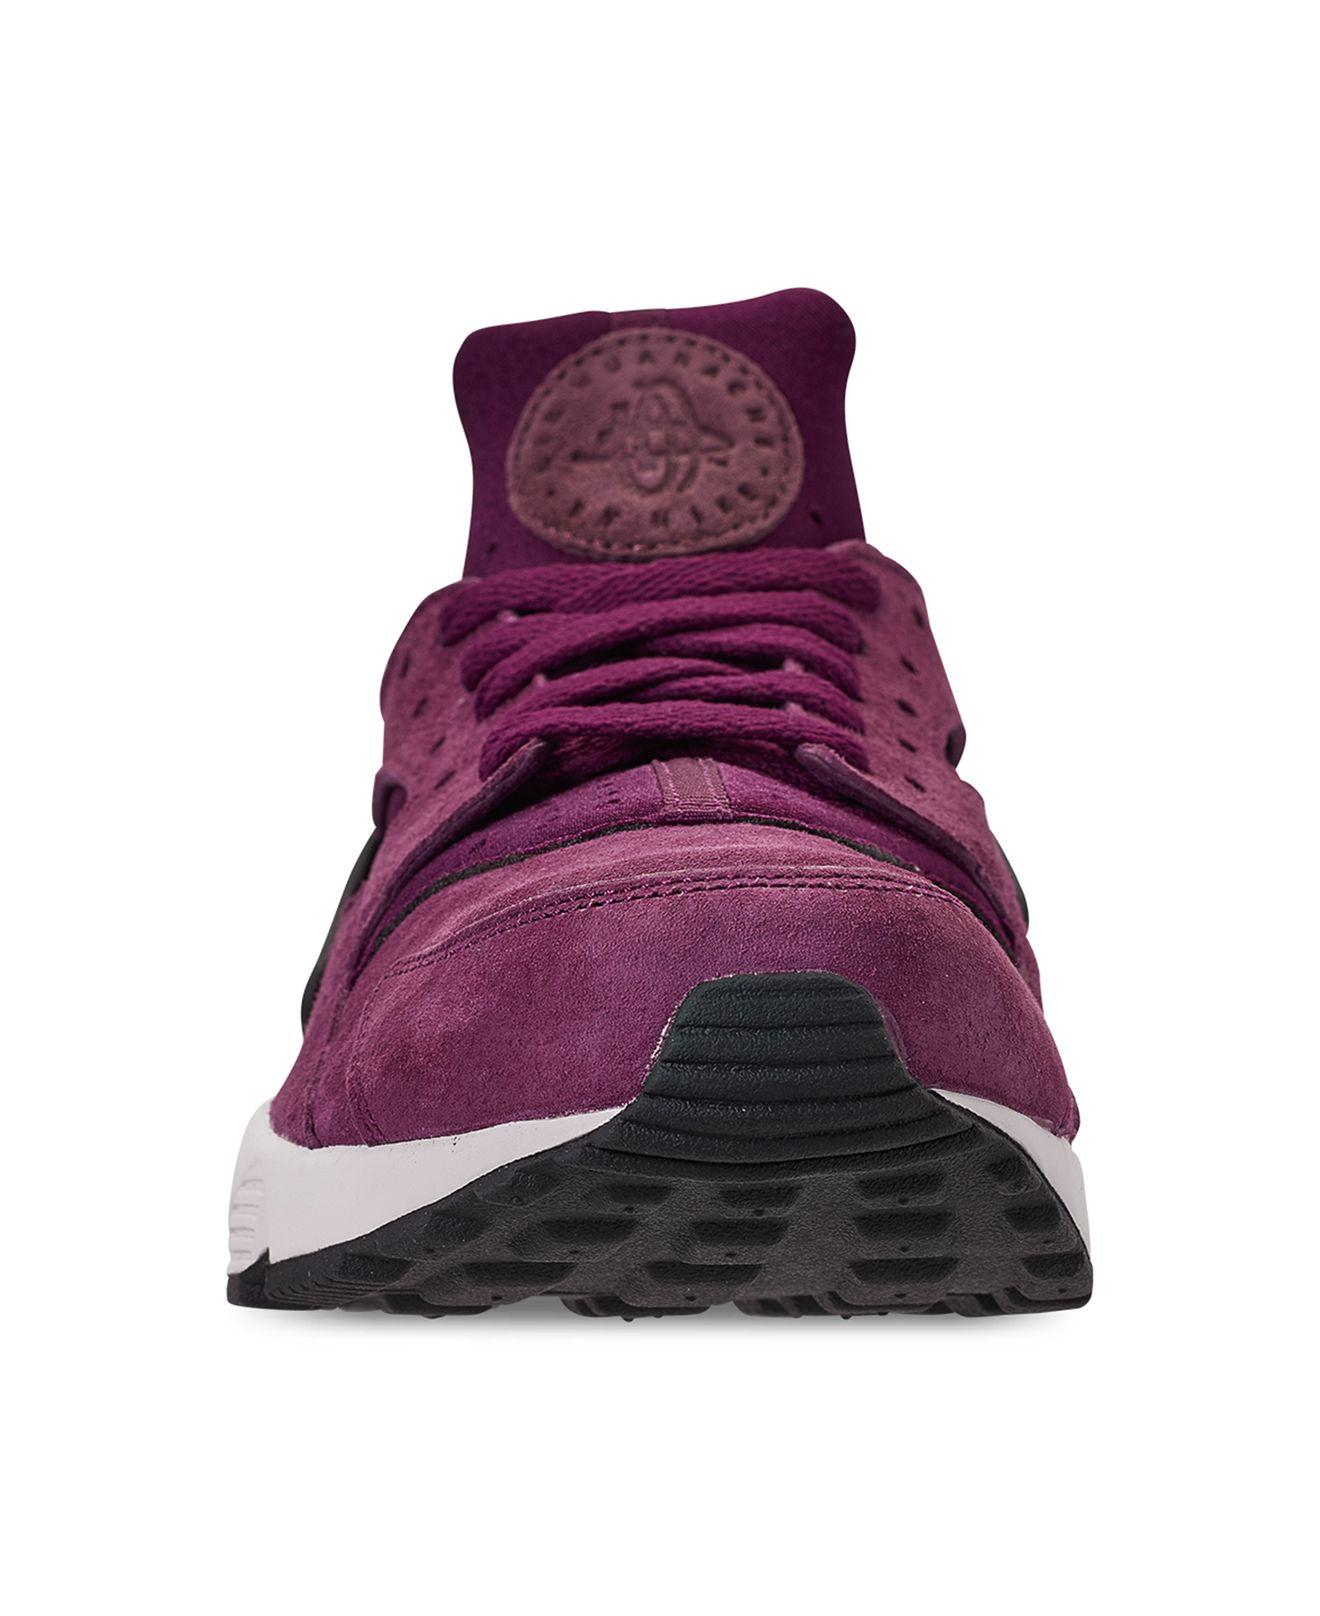 9b2b9406eda84 Nike - Purple Air Huarache Run Premium Running Sneakers From Finish Line  for Men - Lyst. View fullscreen